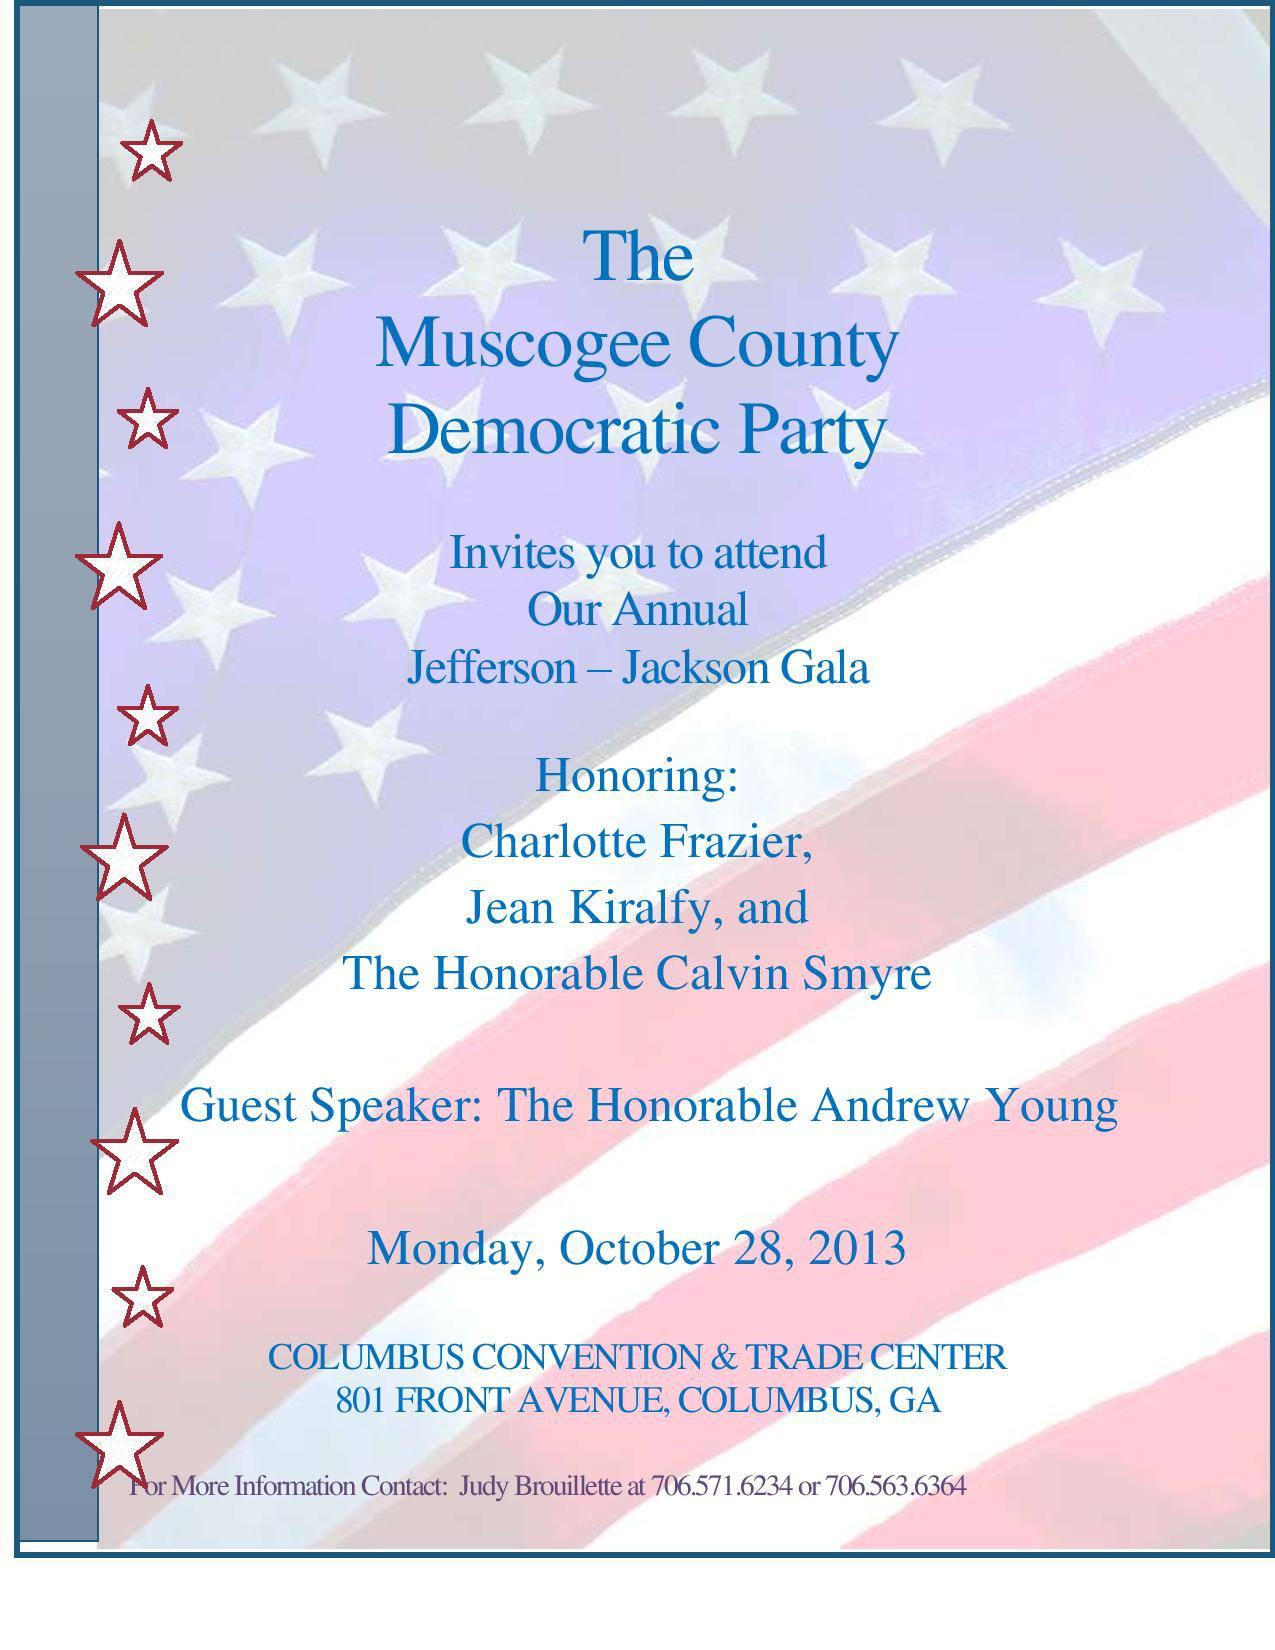 EVENT: Jefferson-Jackson Gala 2013